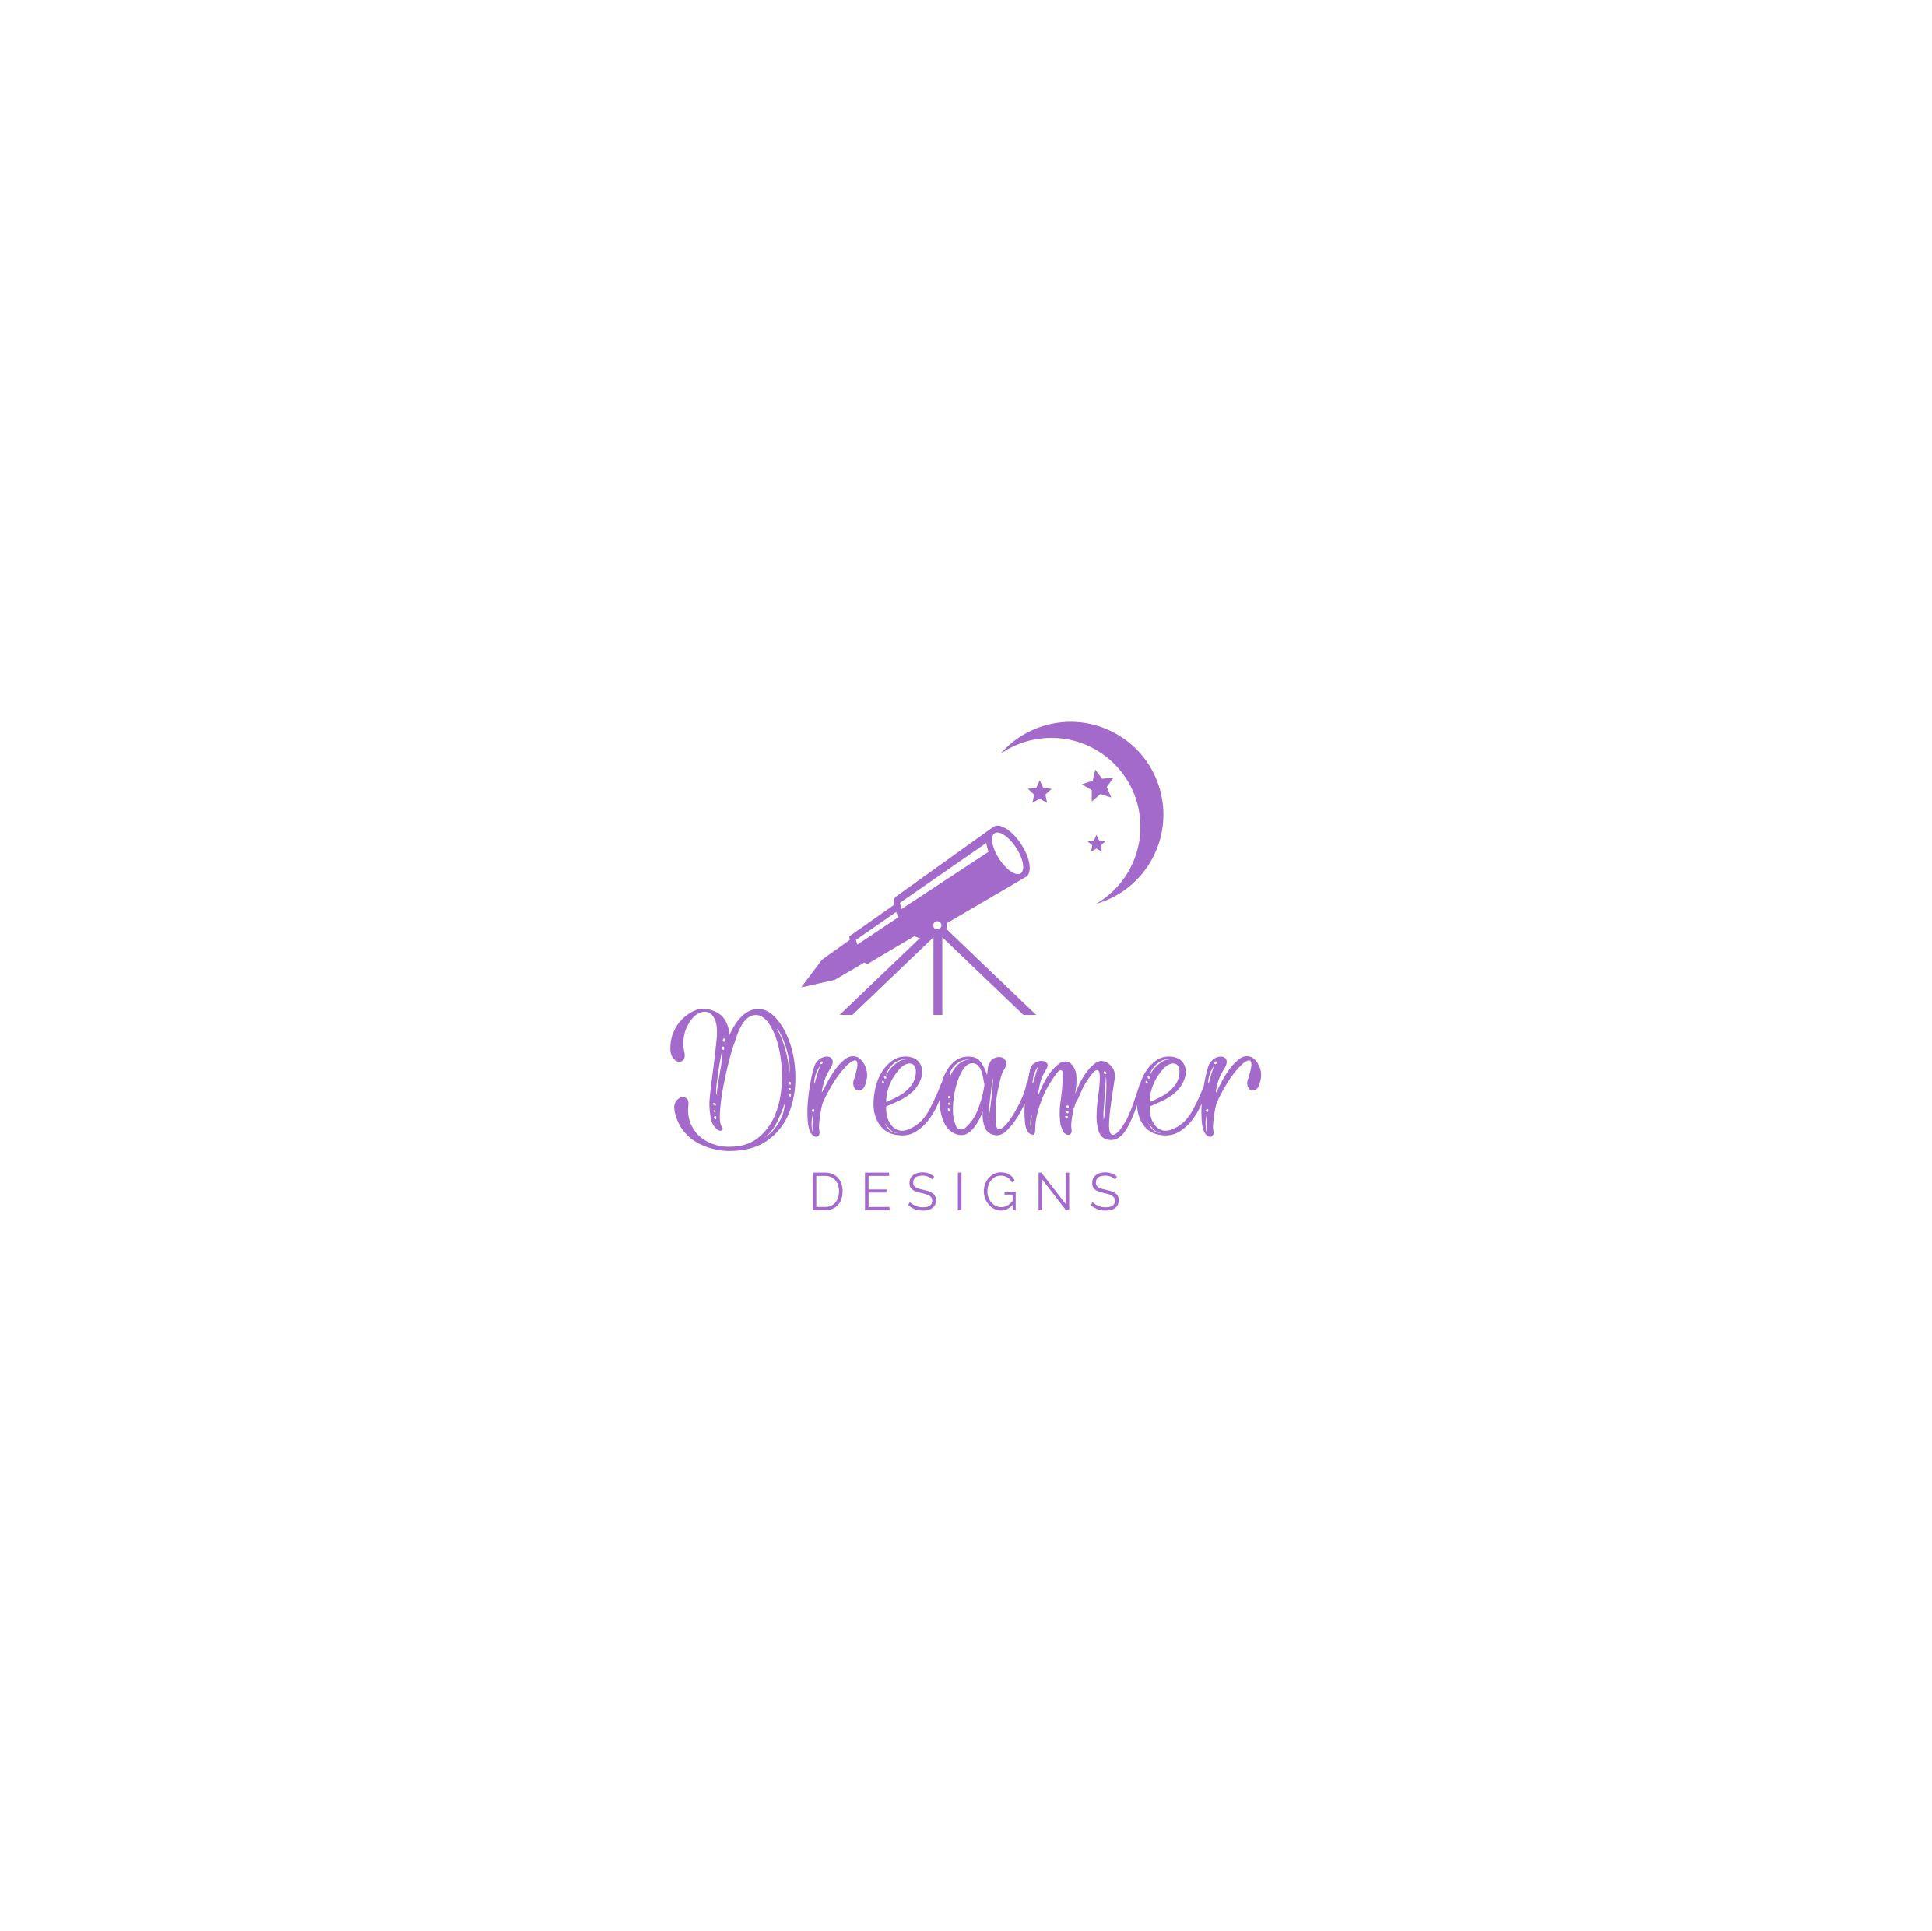 Design a modern/artsy logo for Dreamer Designs website.